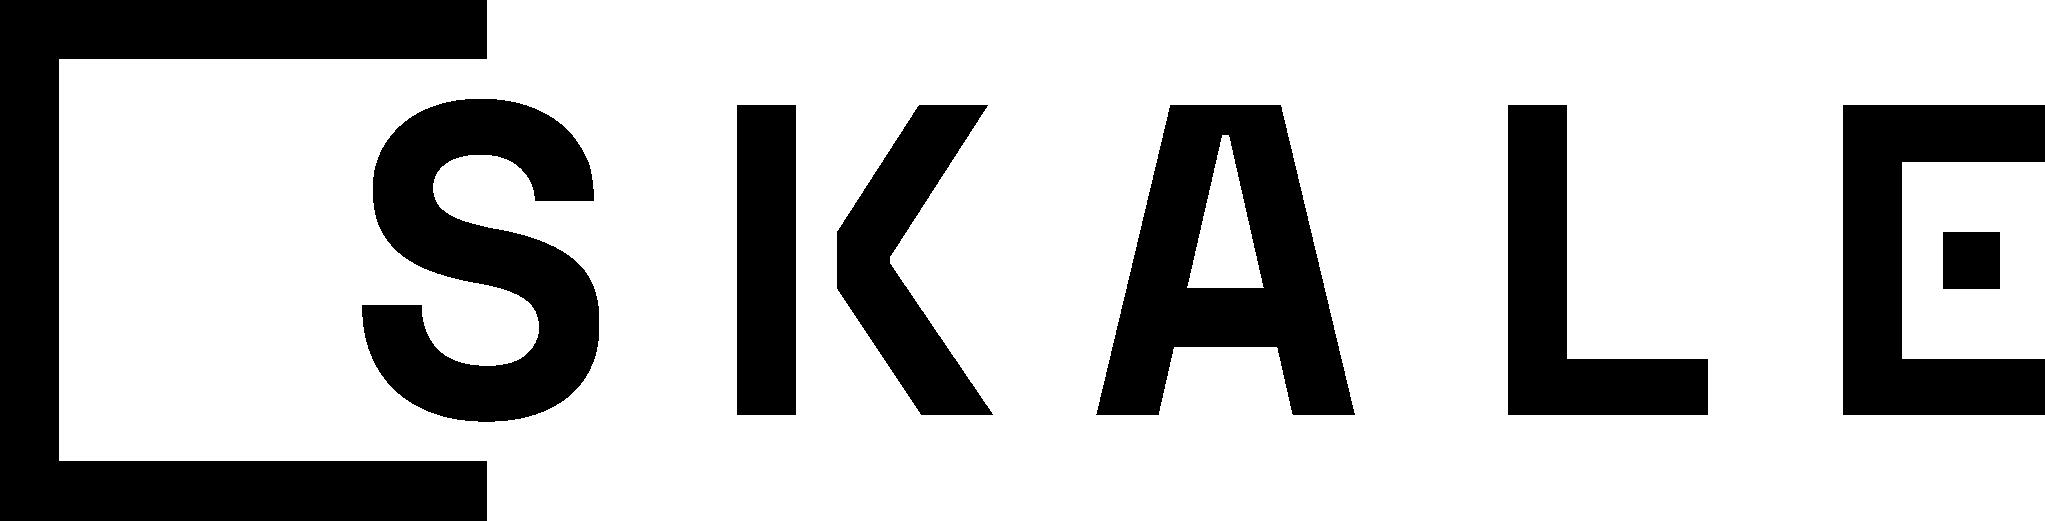 SKALE Network Forum